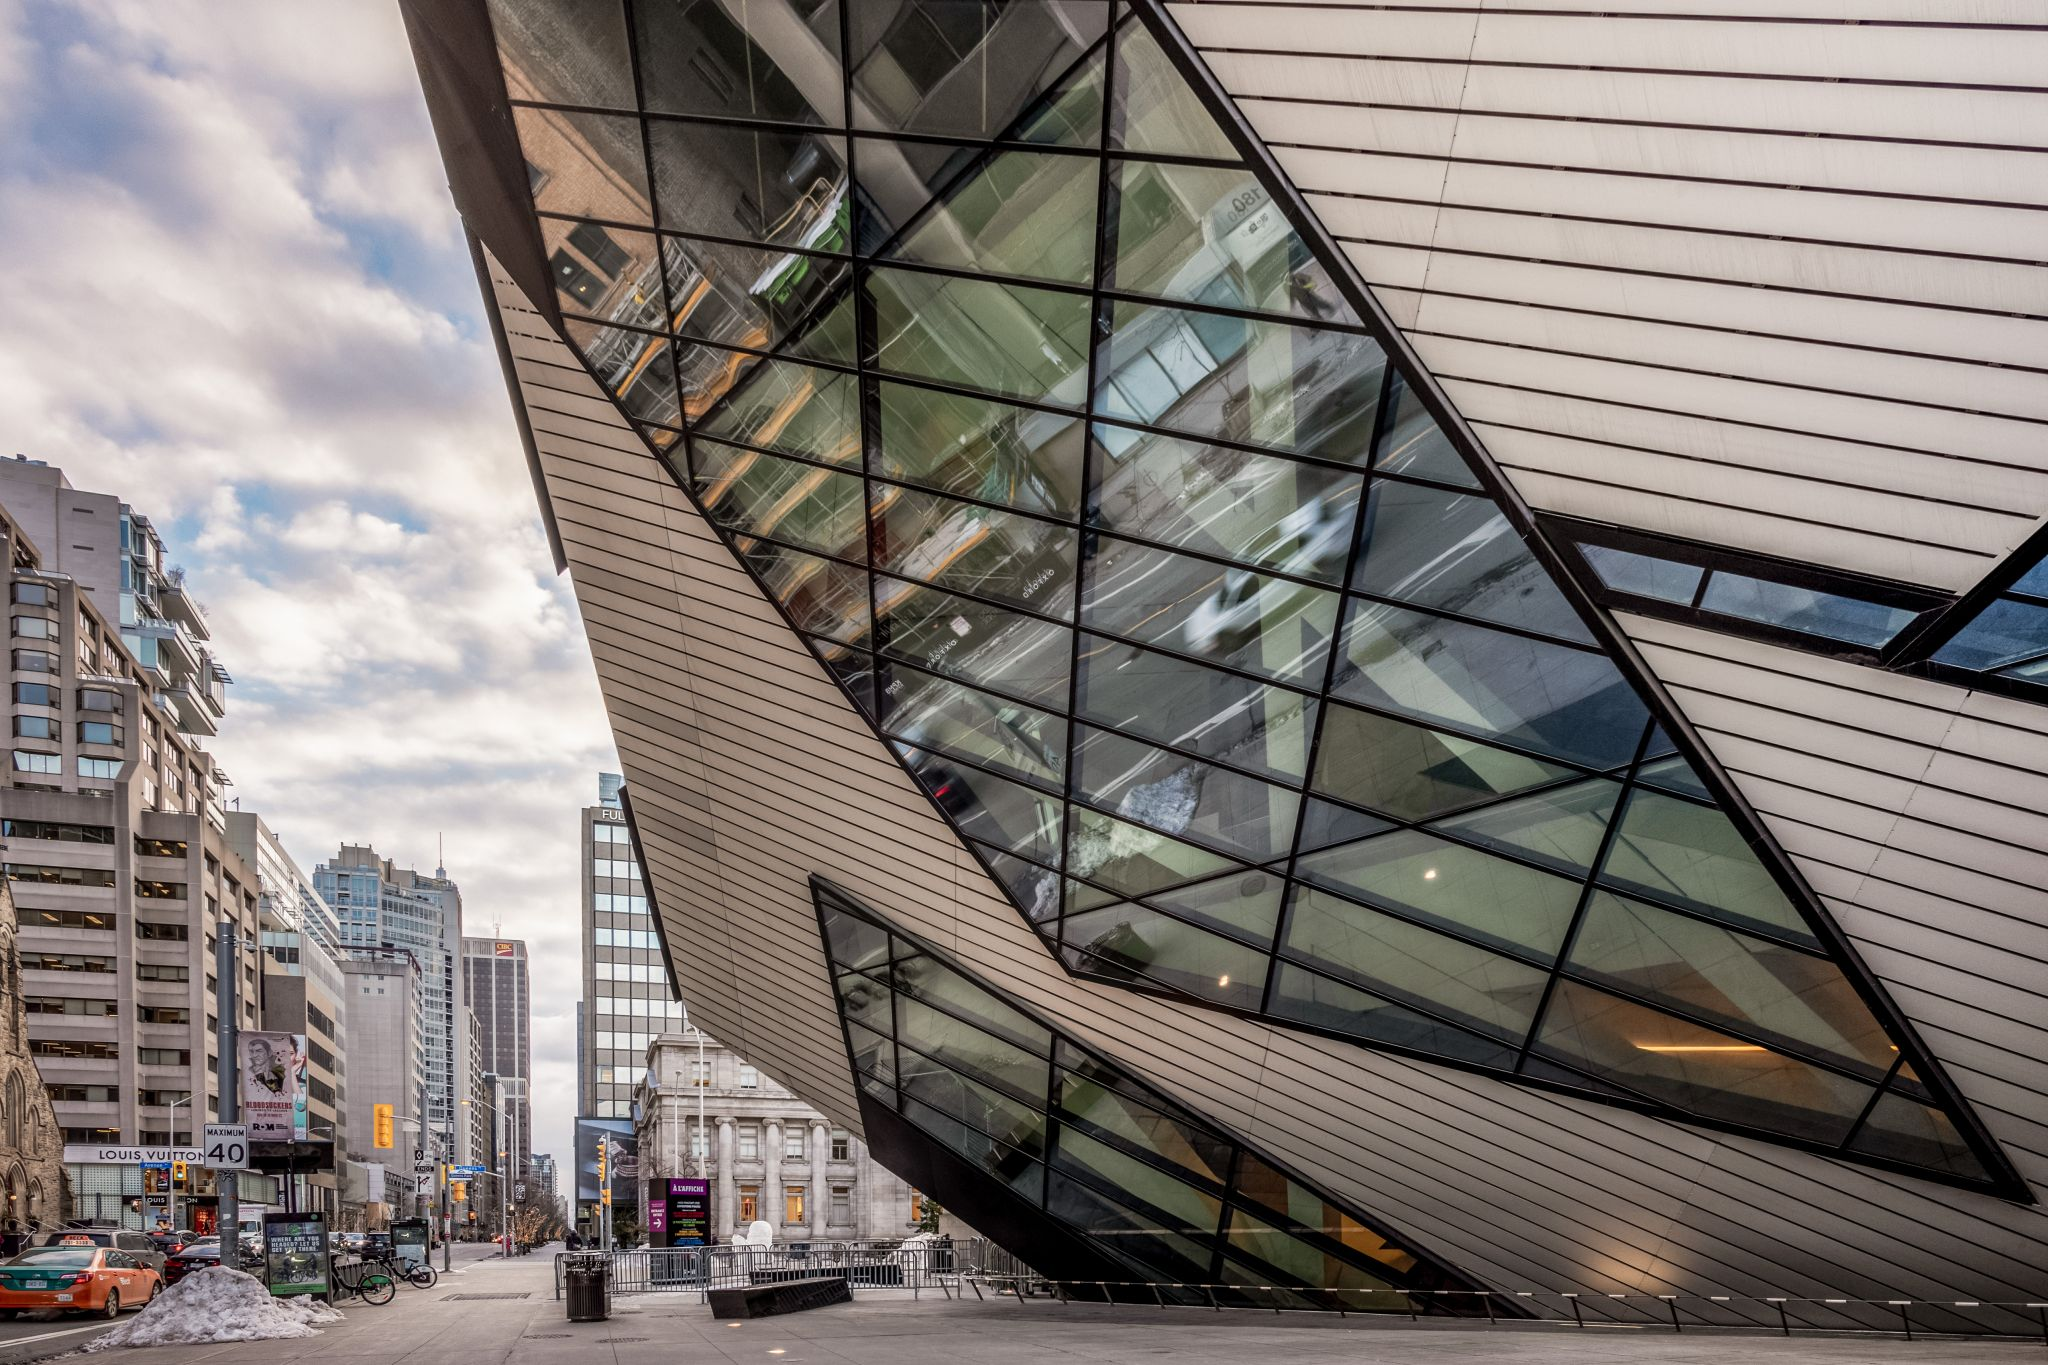 Royal Ontario Museum (ROM), Canada